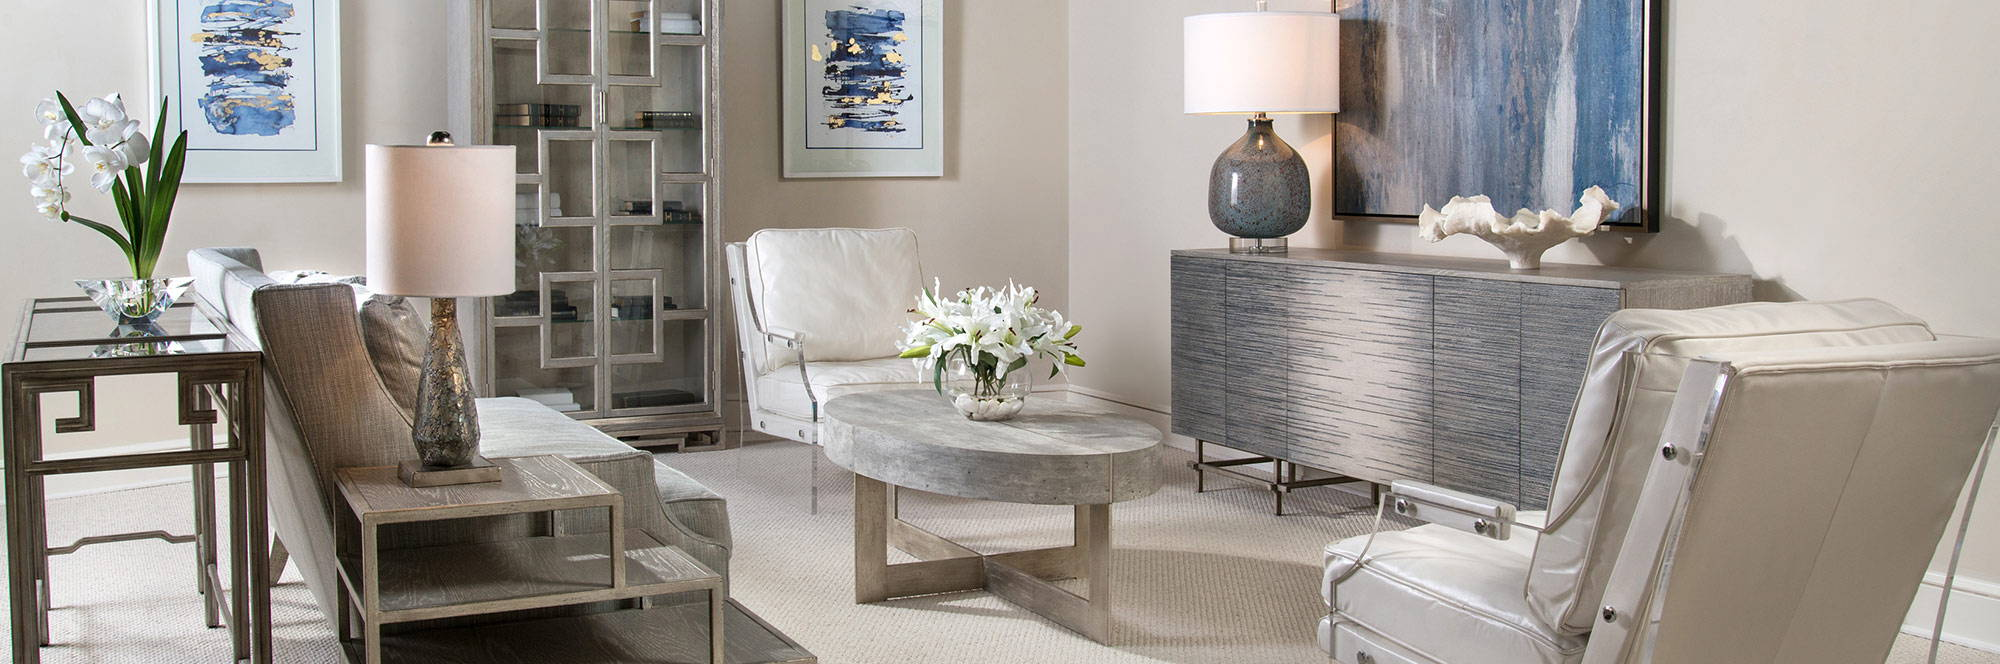 John-Richard Furniture & Home Accessories - Living Room Scheme - LuxDeco.com